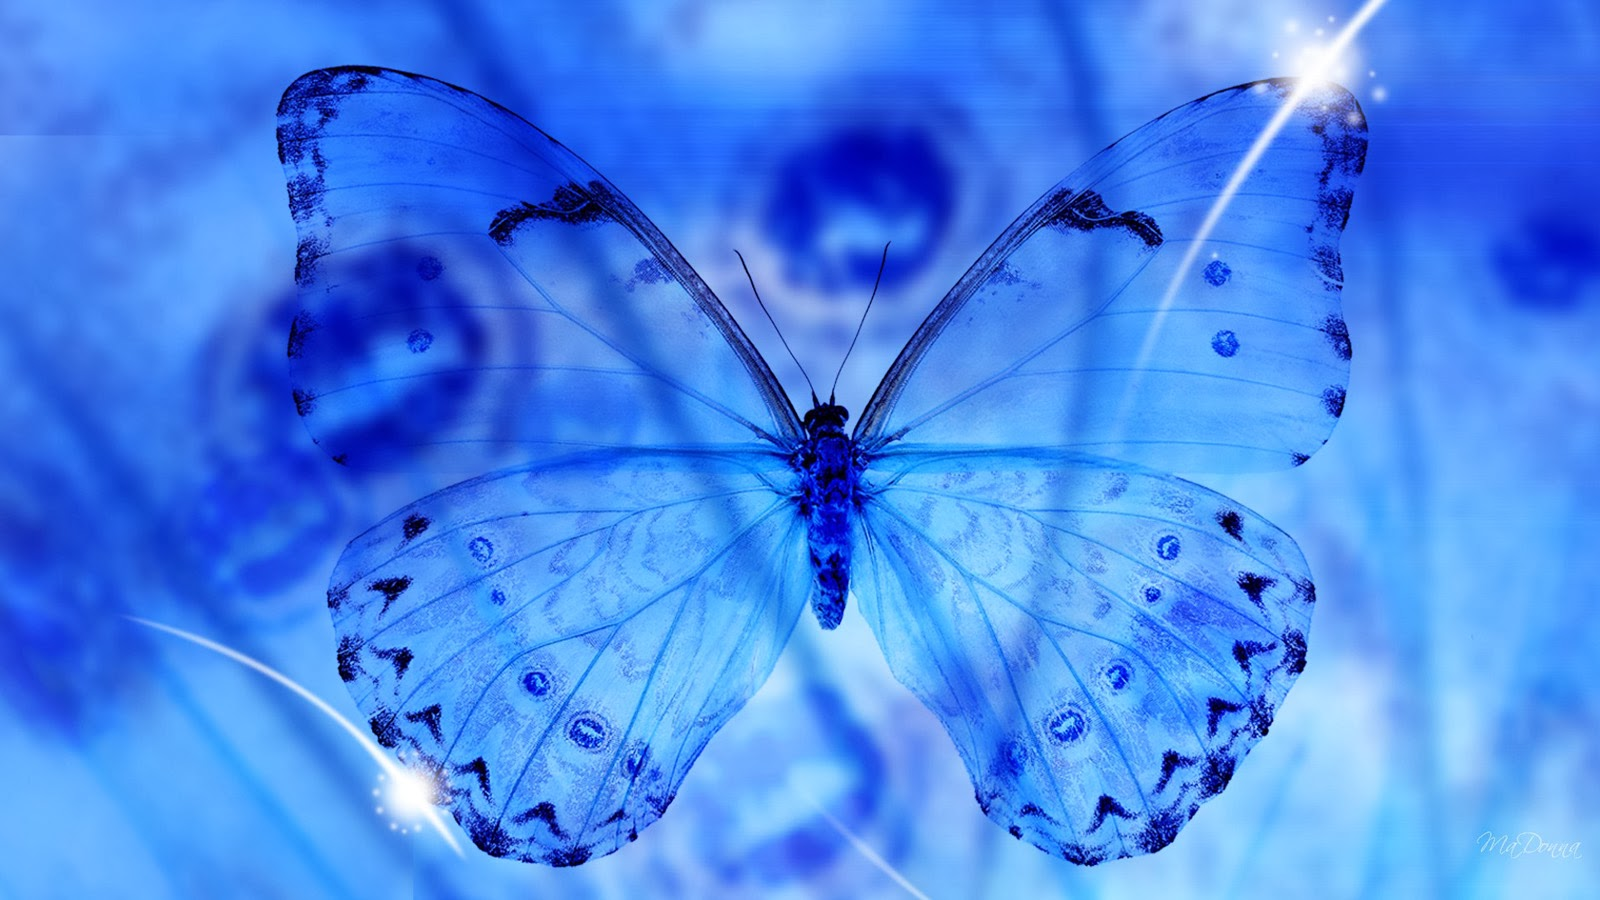 50+ 3D Butterfly Wallpaper Free Download on WallpaperSafari